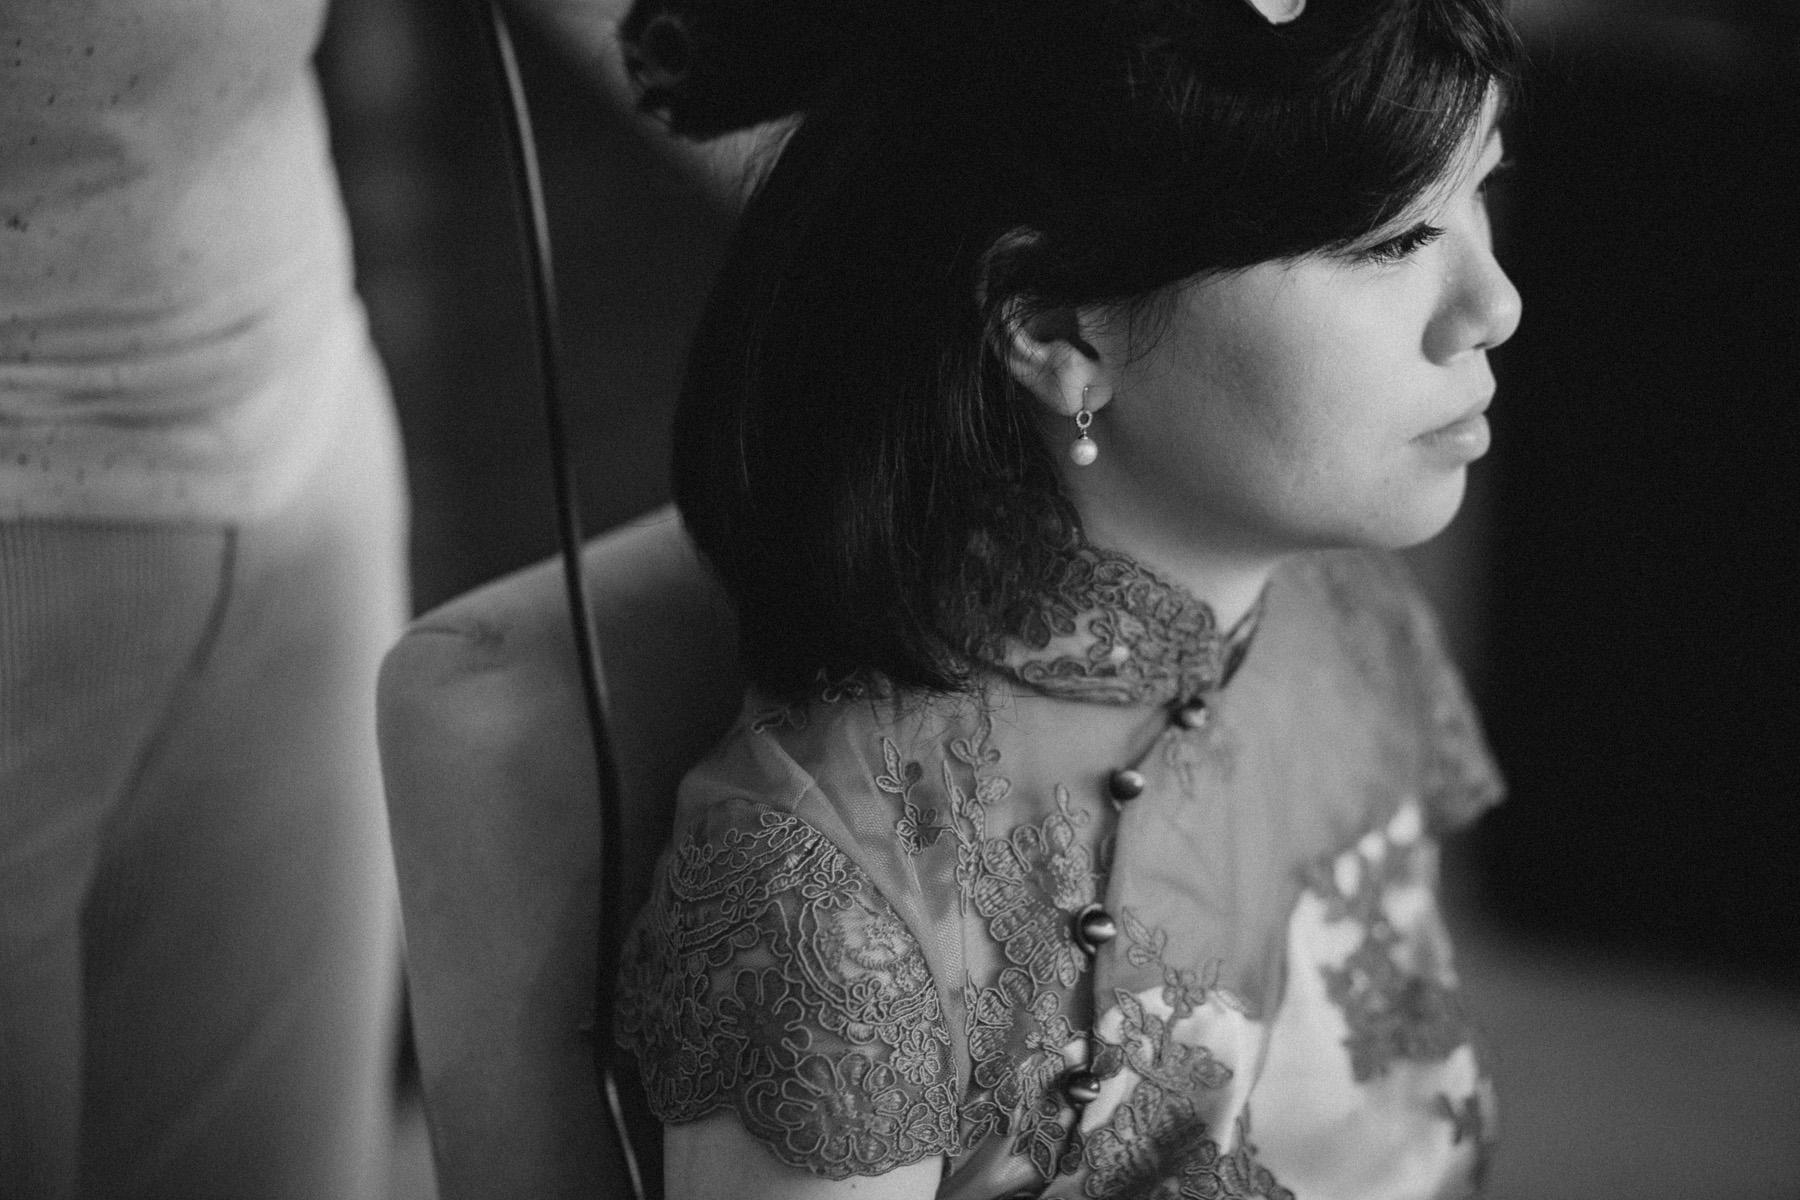 singapore-wedding-travel-photographer-faith-alvin-wedding-wmt-04.jpg